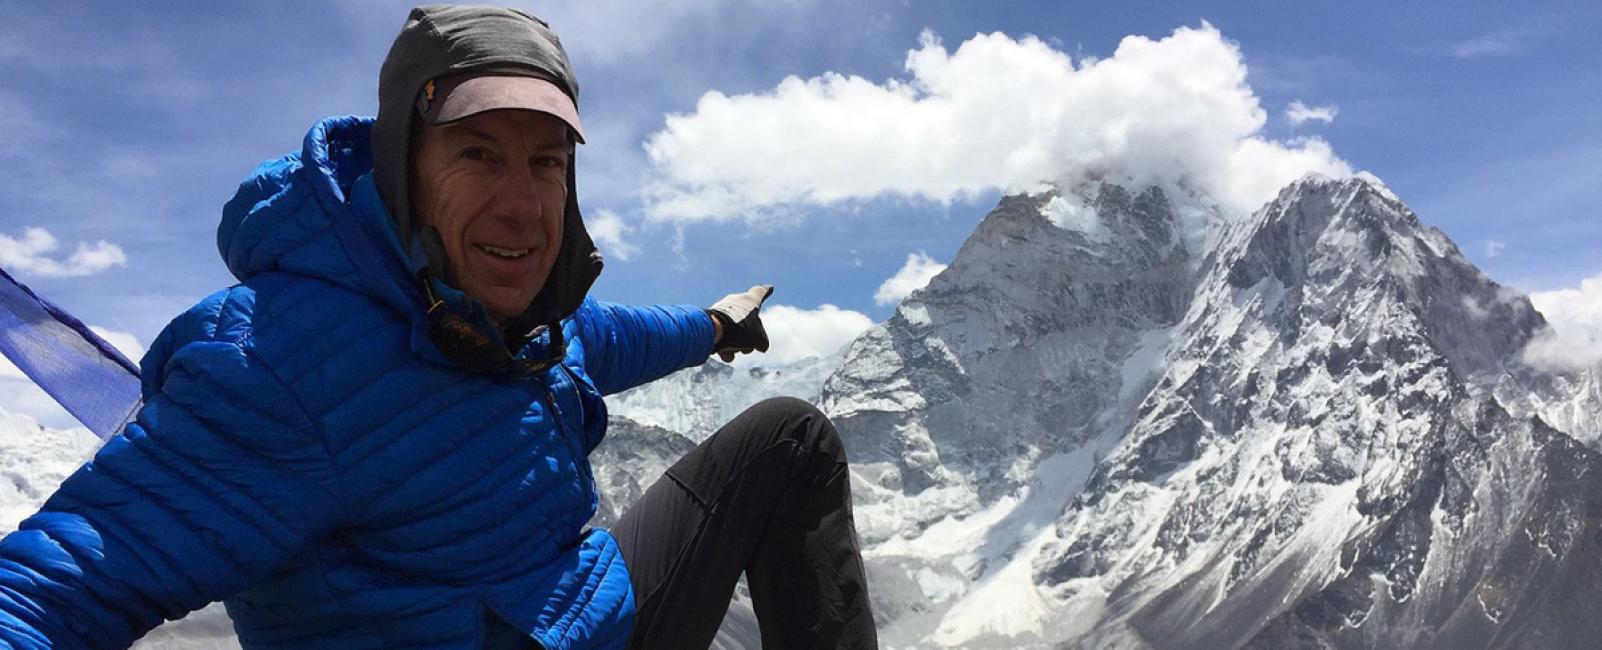 Powder People - Summiting Everest